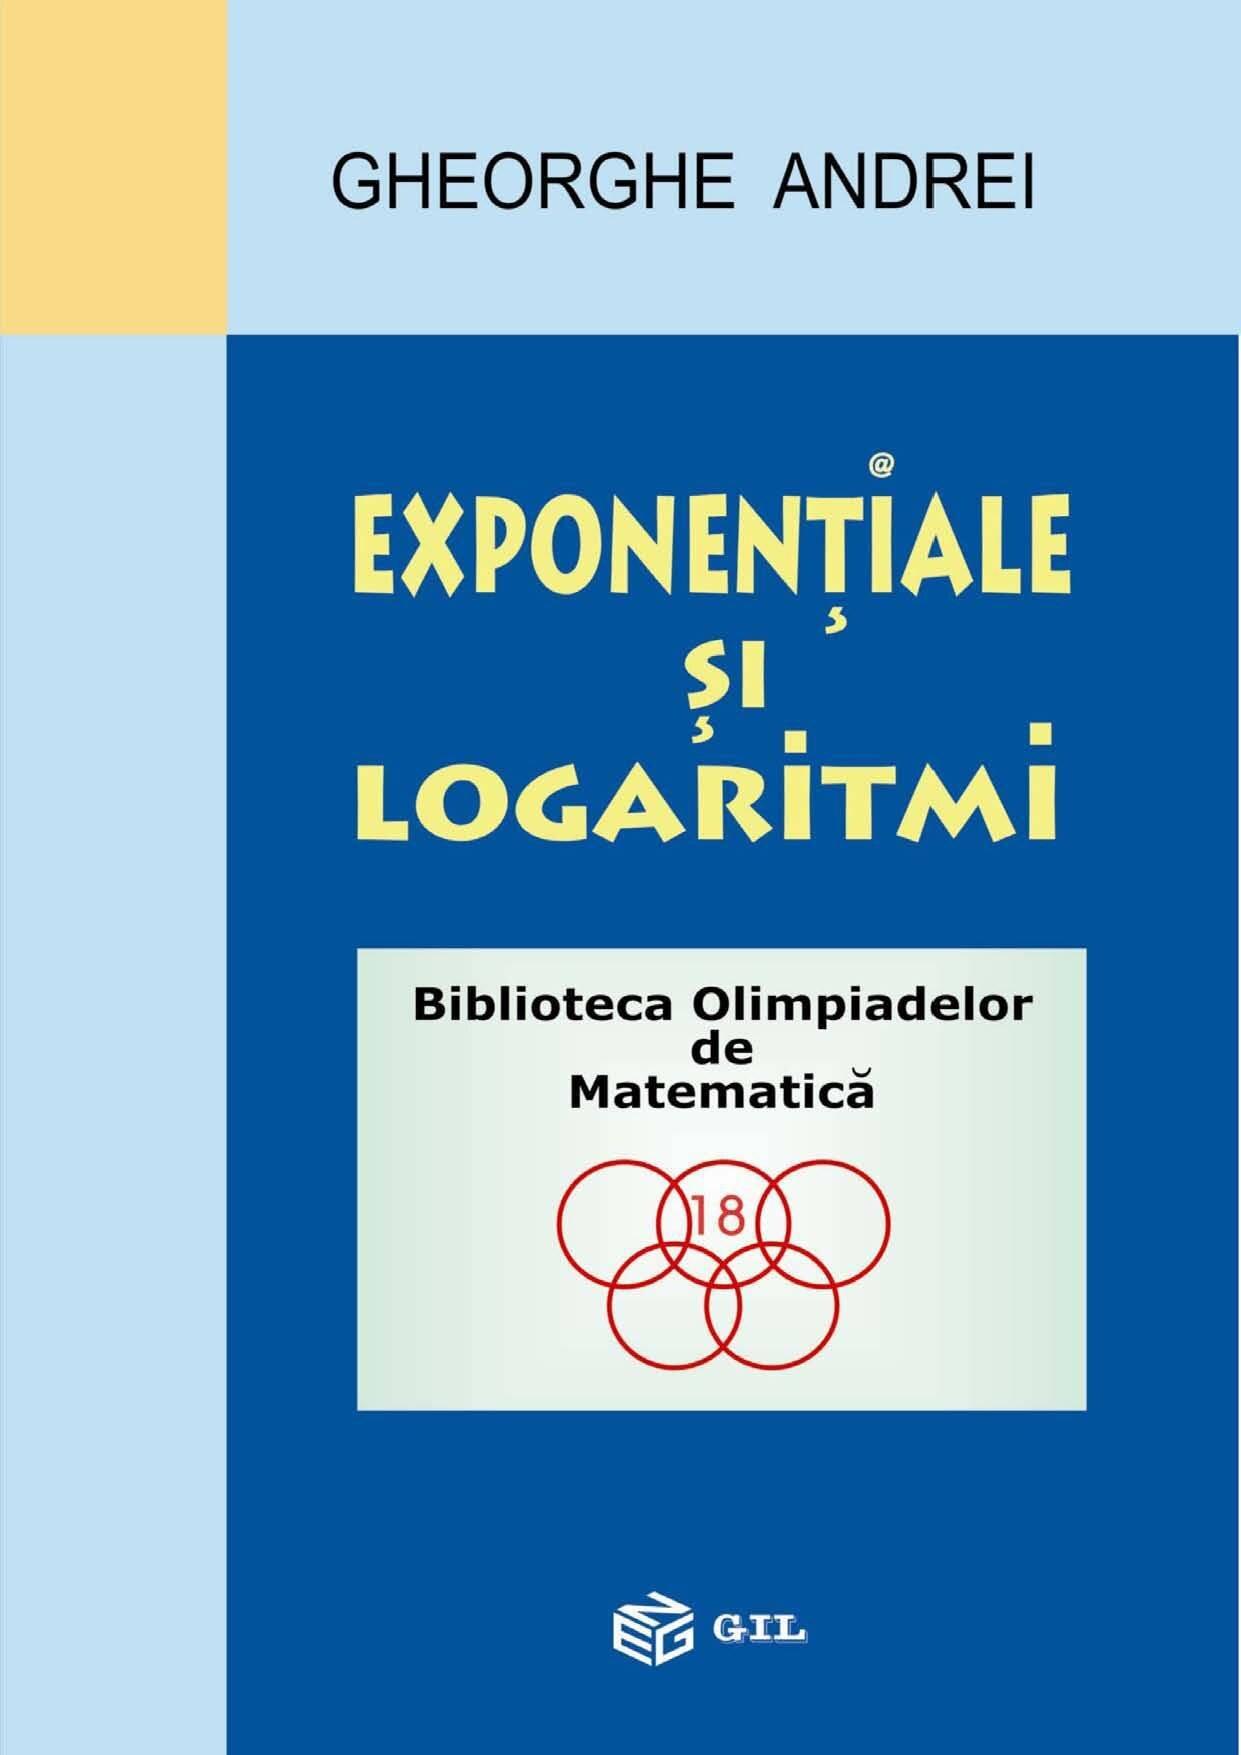 Exponentiale si logaritmi (eBook)